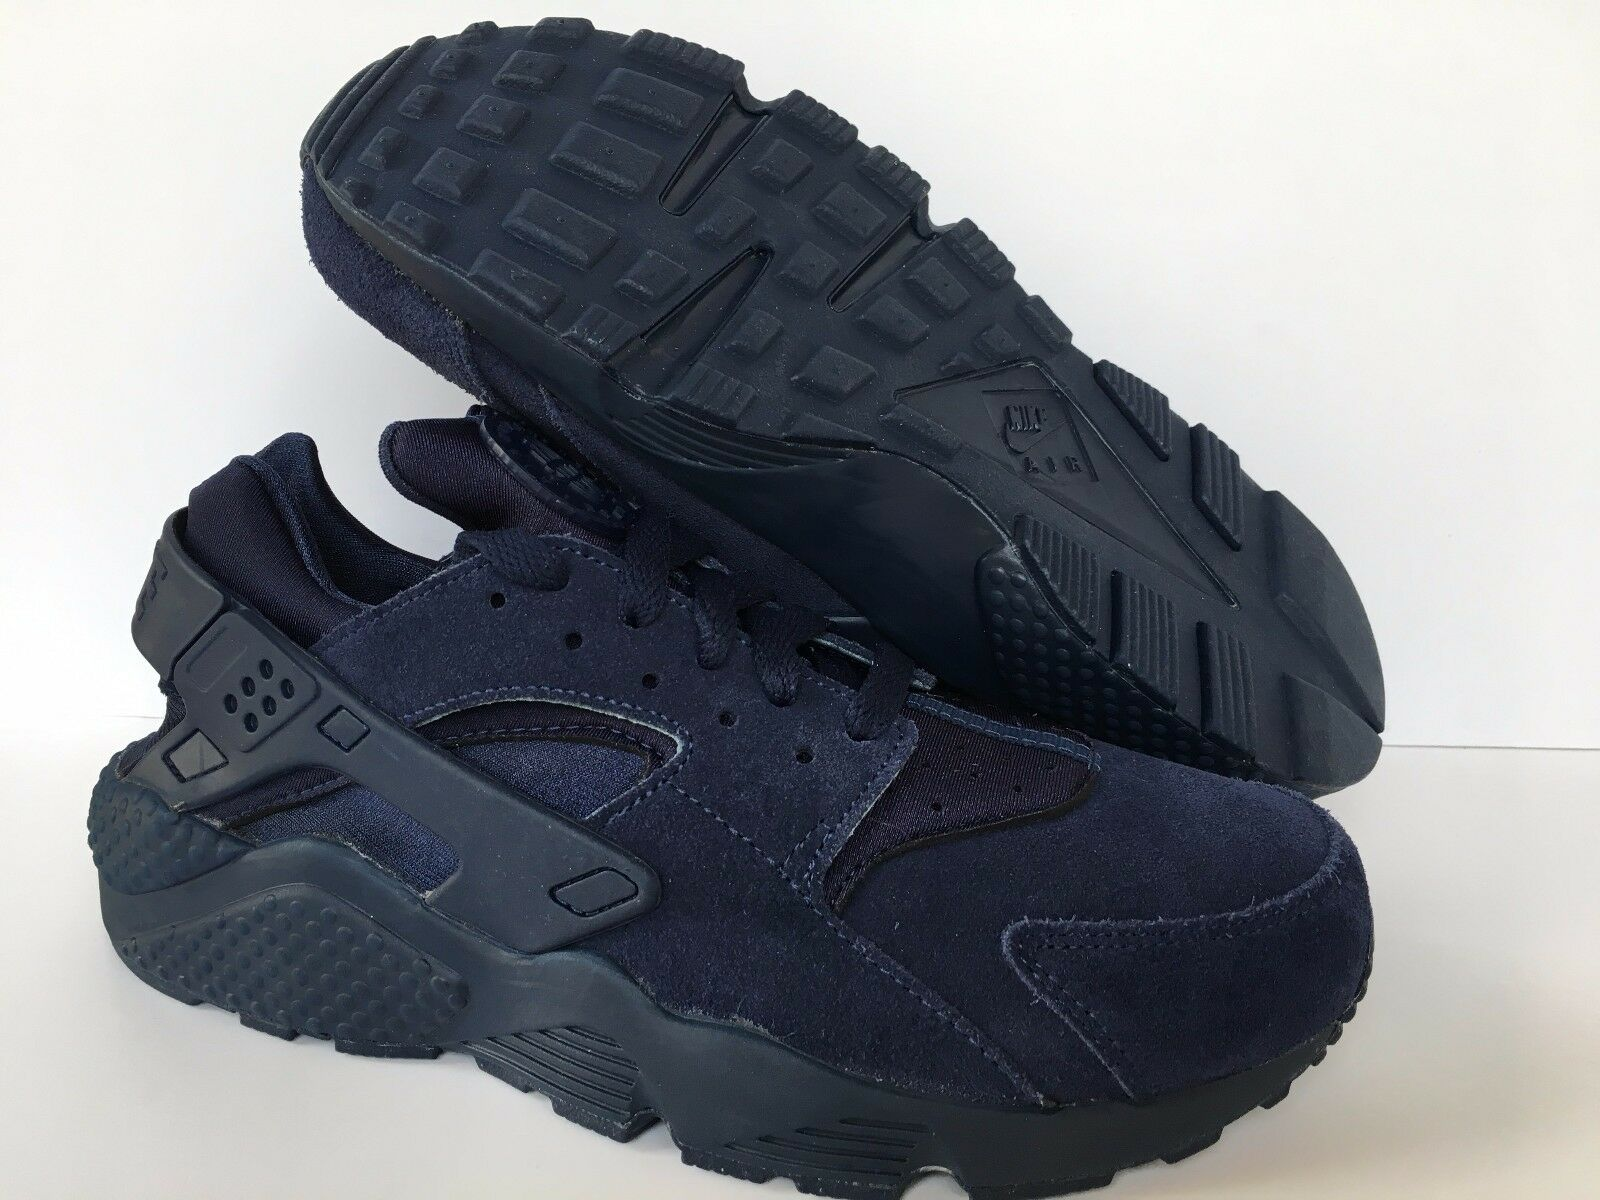 Nike Air Huarache courir iD NikeiD Bleu Leather homme 777330 989 Sz 8